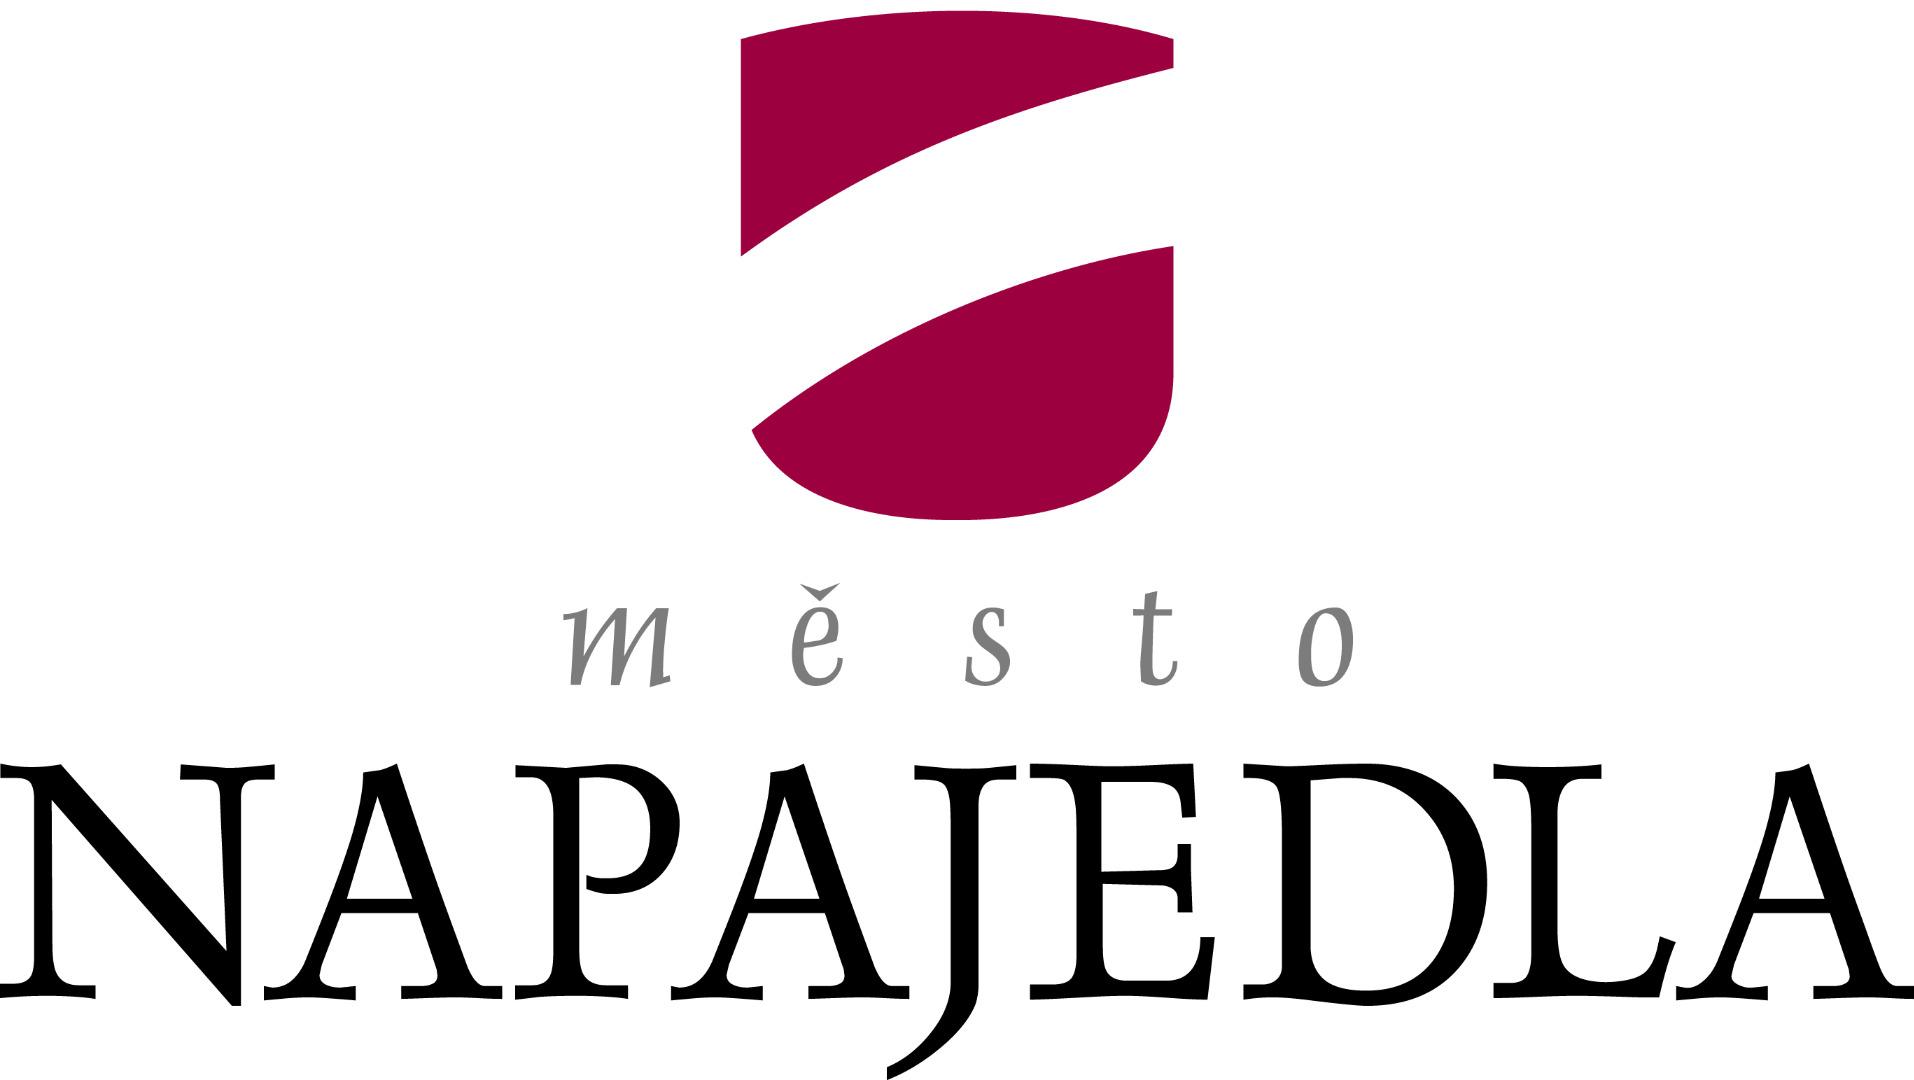 http://napajedla.cz/galerie/14/logo%20napajedla.jpg